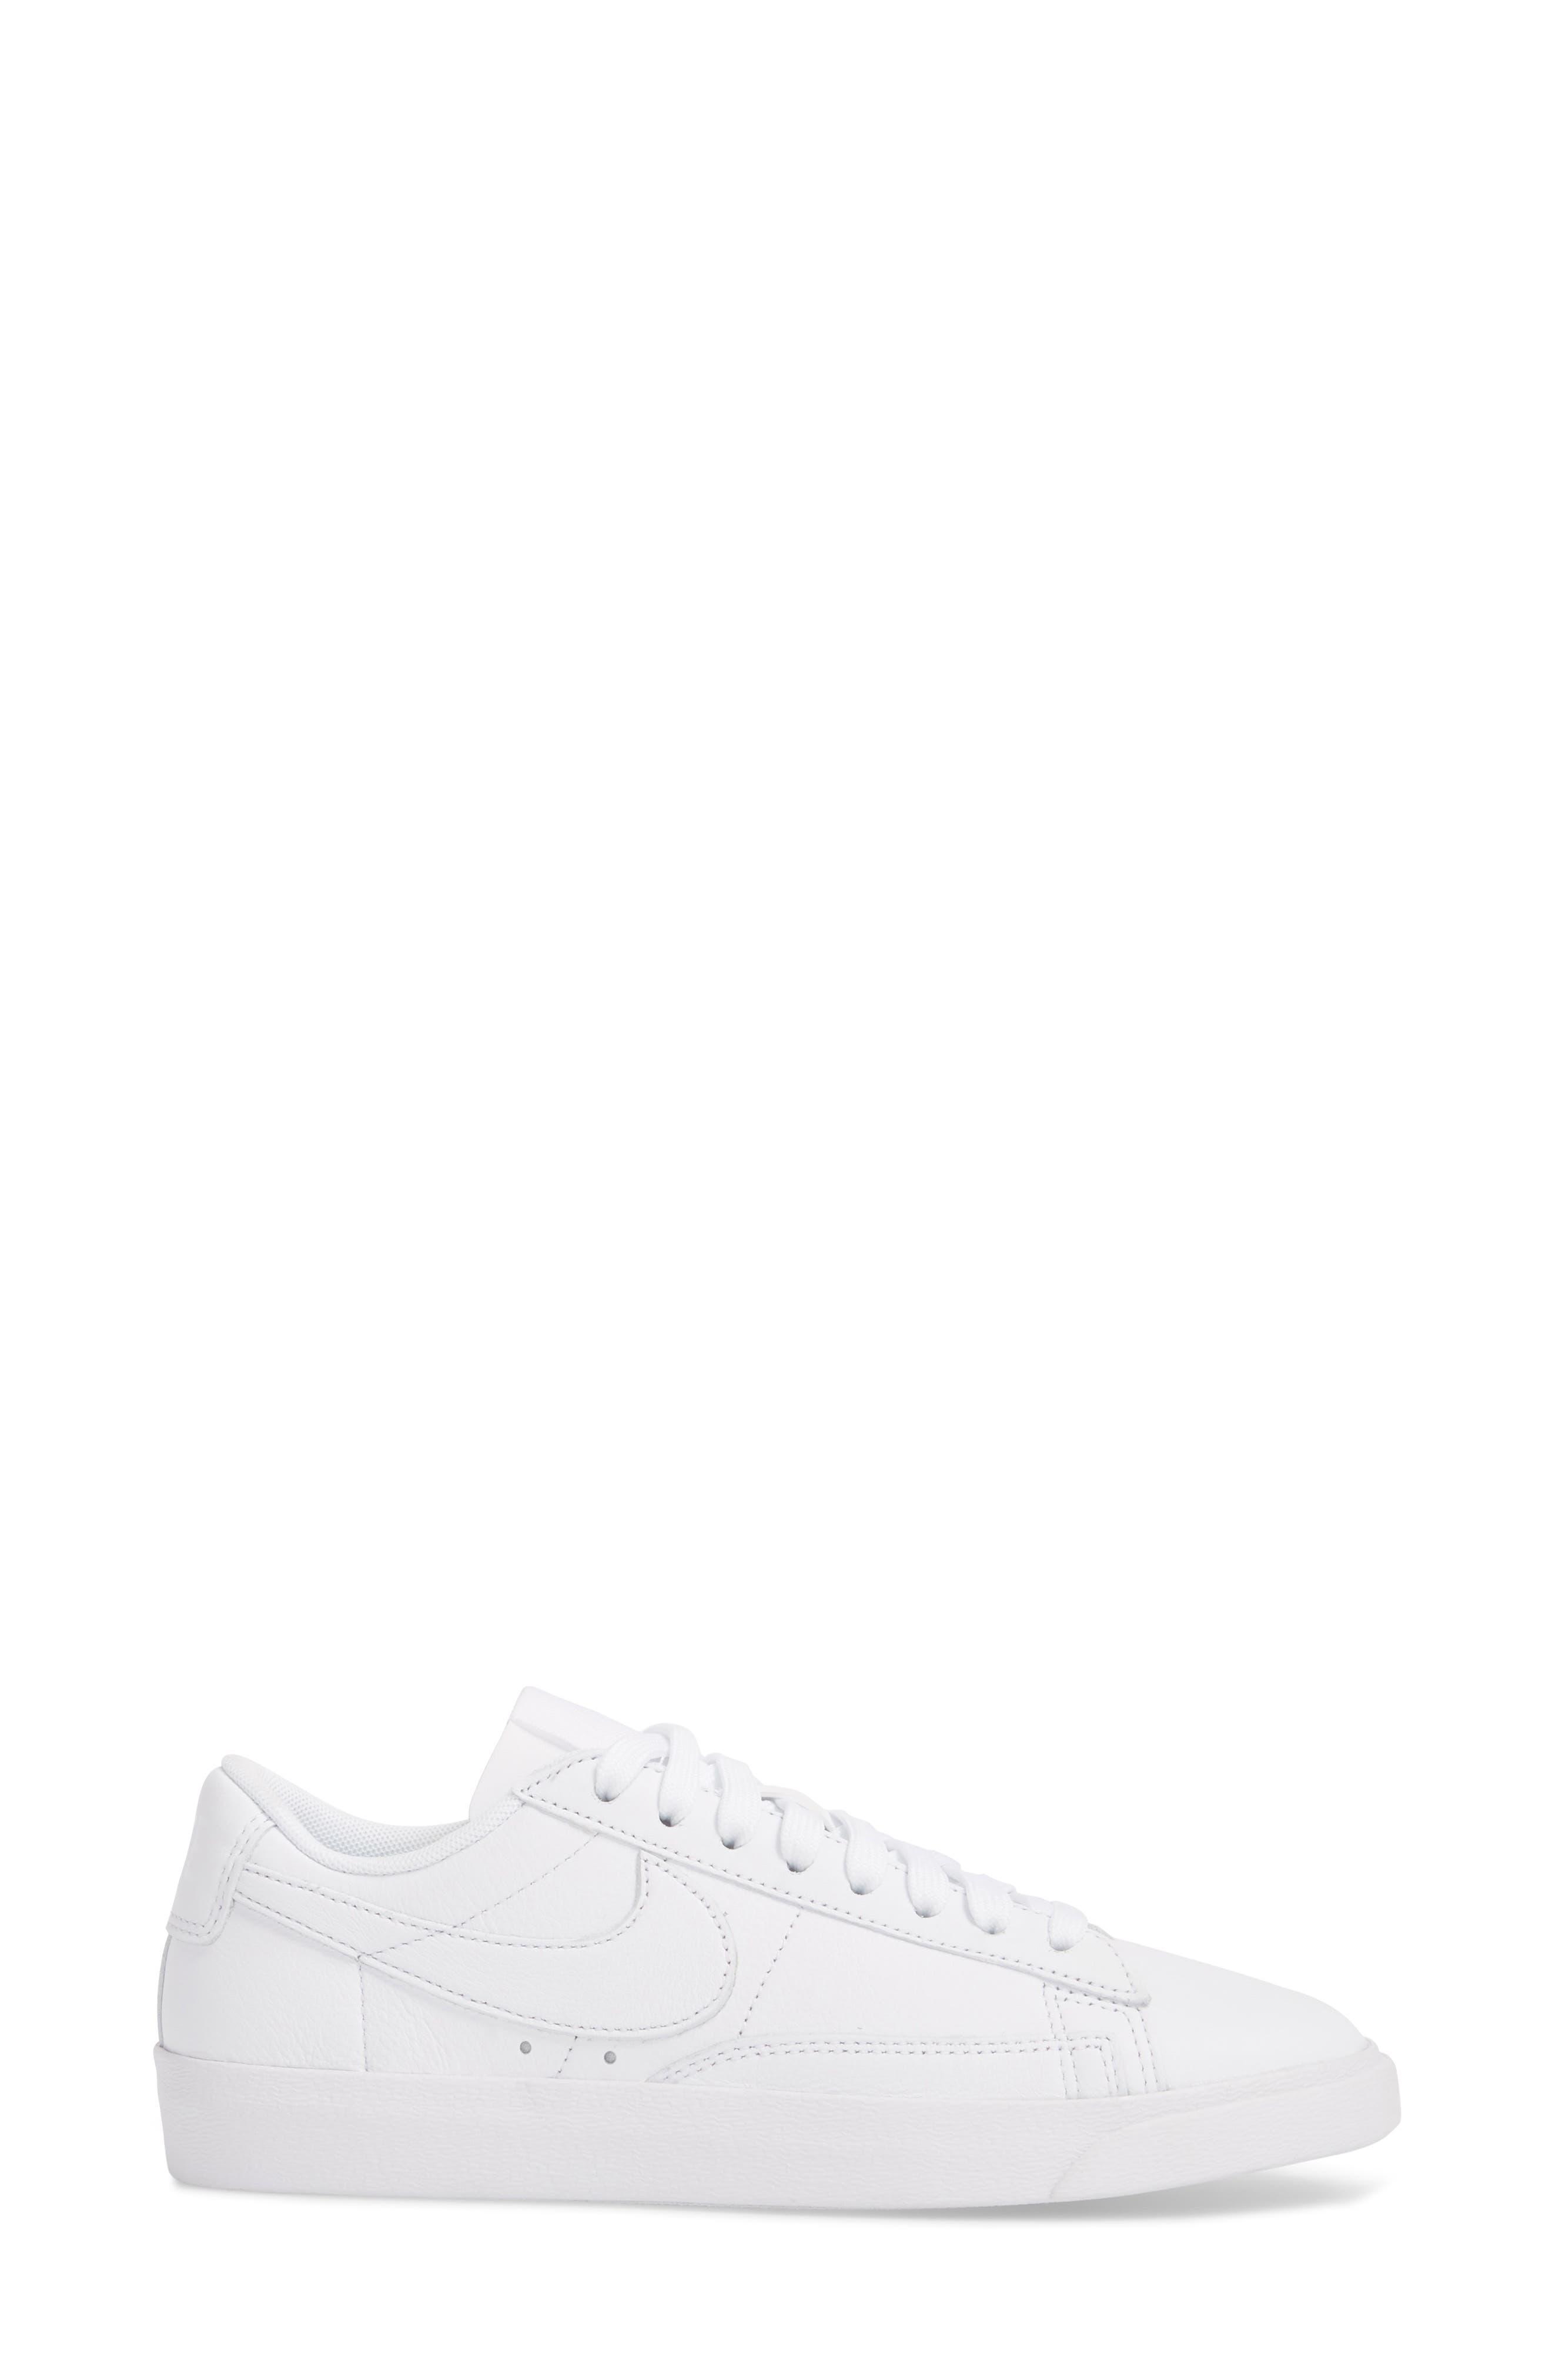 Blazer Low LE Sneaker,                             Alternate thumbnail 3, color,                             104